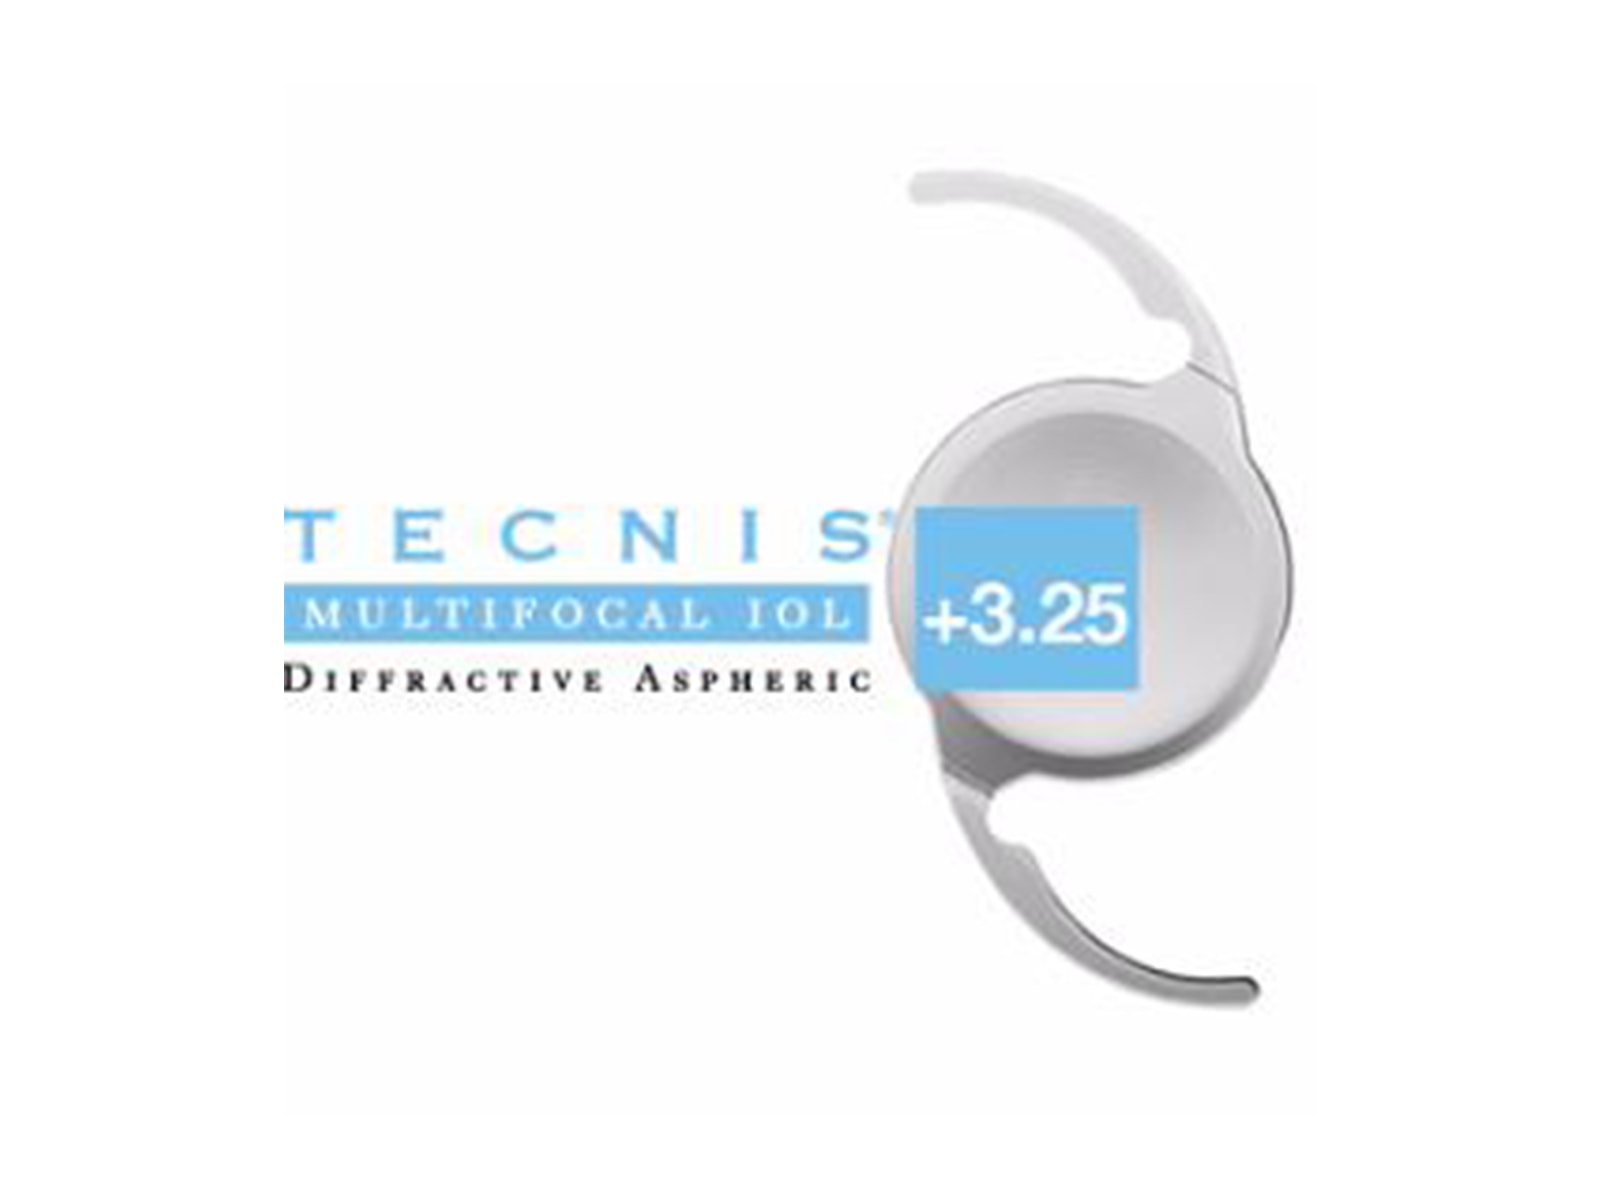 TECNIS Multifocal IOL +3.25 D